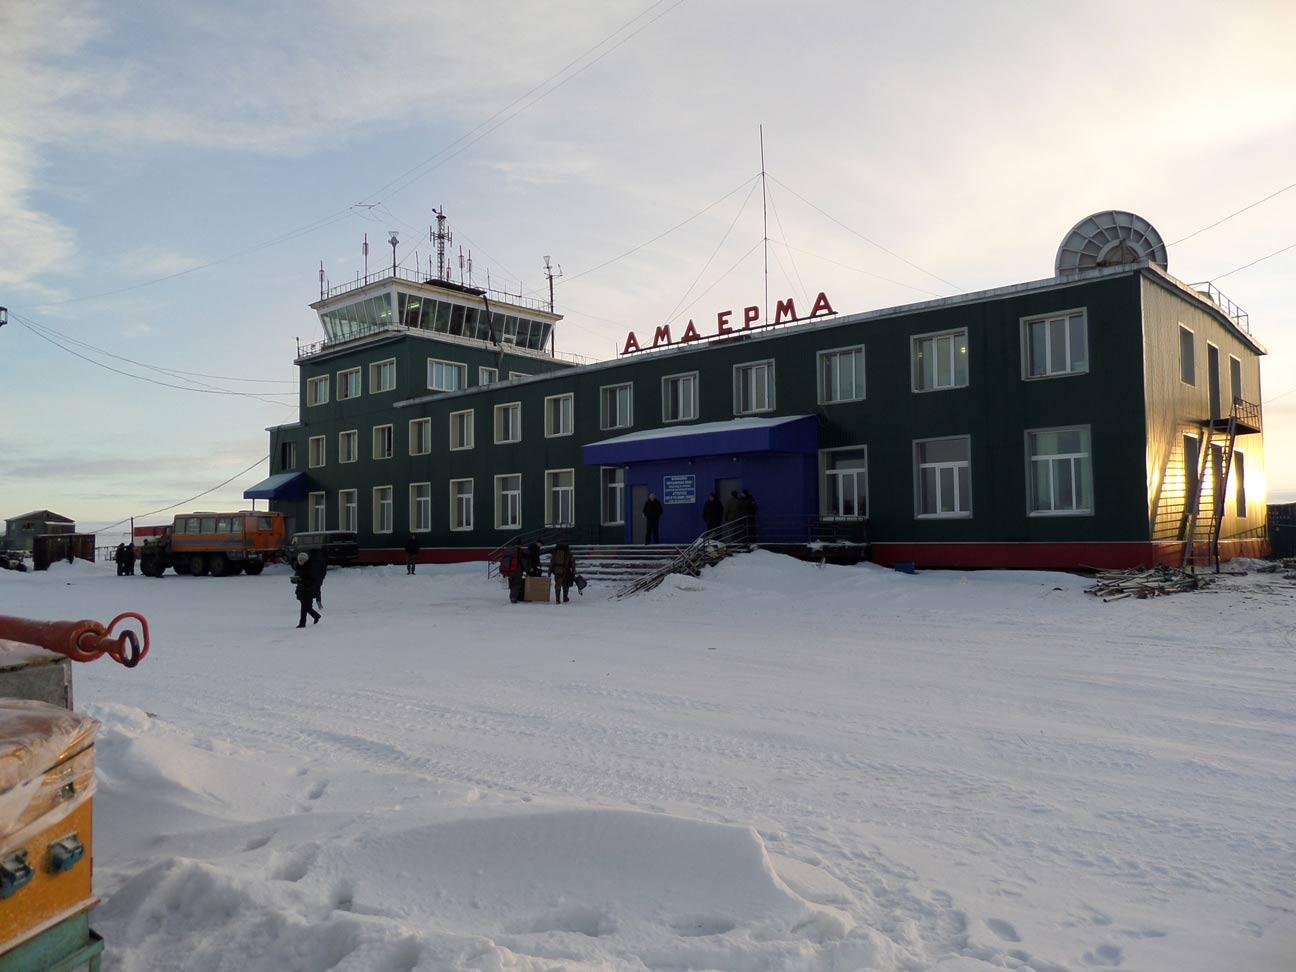 Аэропорт Амдерма || Как с Добром ...: kakdobratsyado.ru/country/rf/aeroports-rf/aeroport-amderma-amderma...